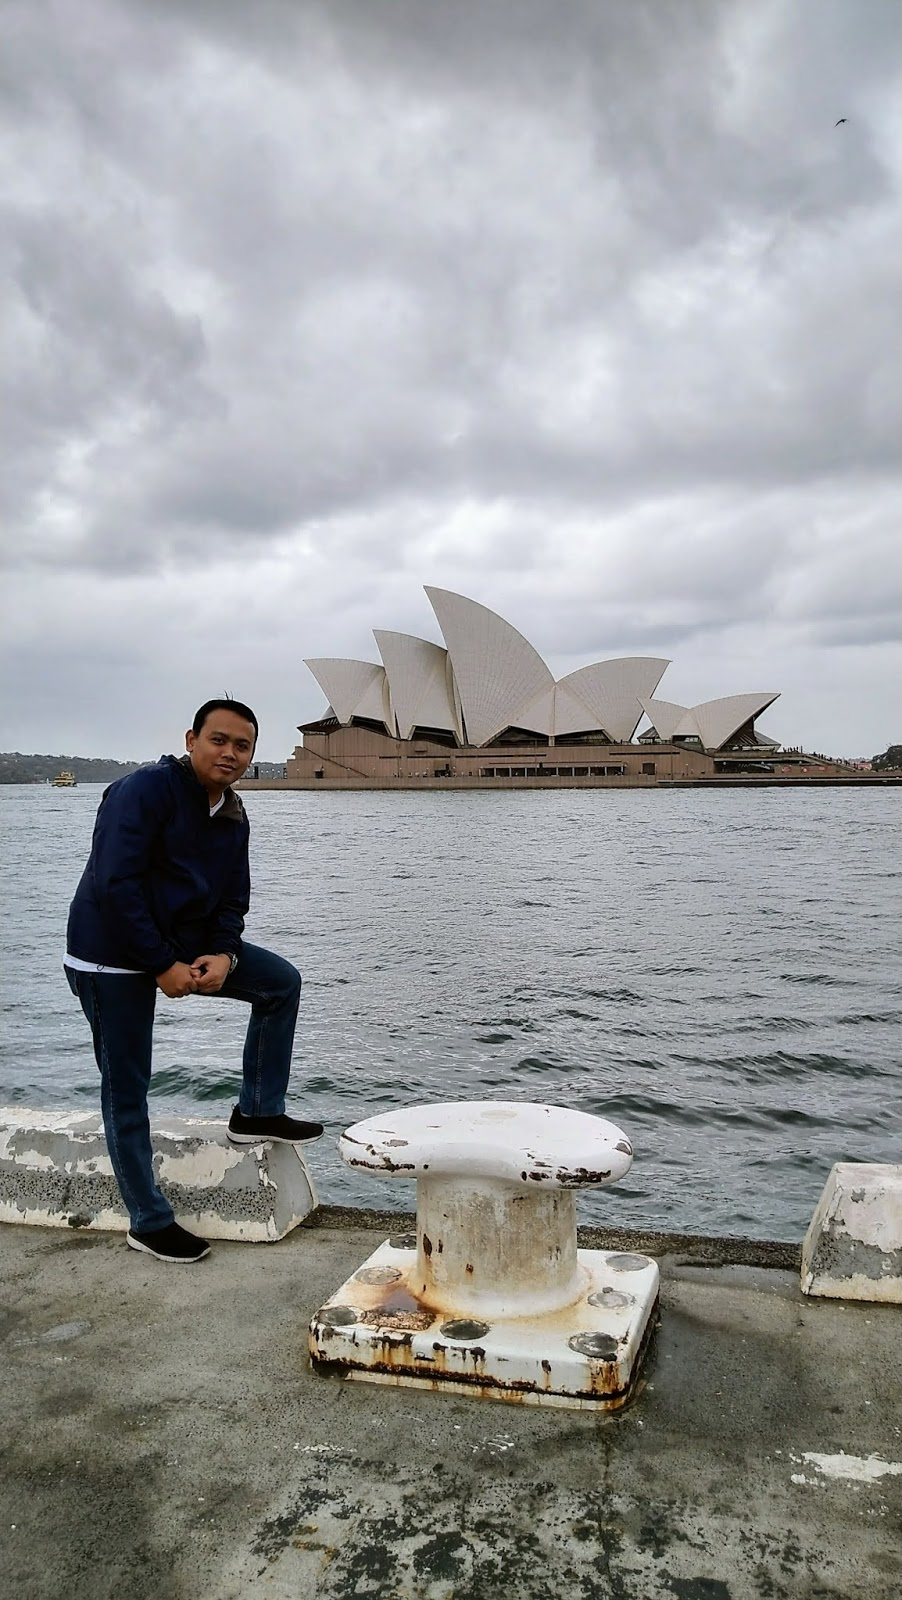 Opera House, The Rocks, Sydney, New South Wales, Australia, irfan-room.com